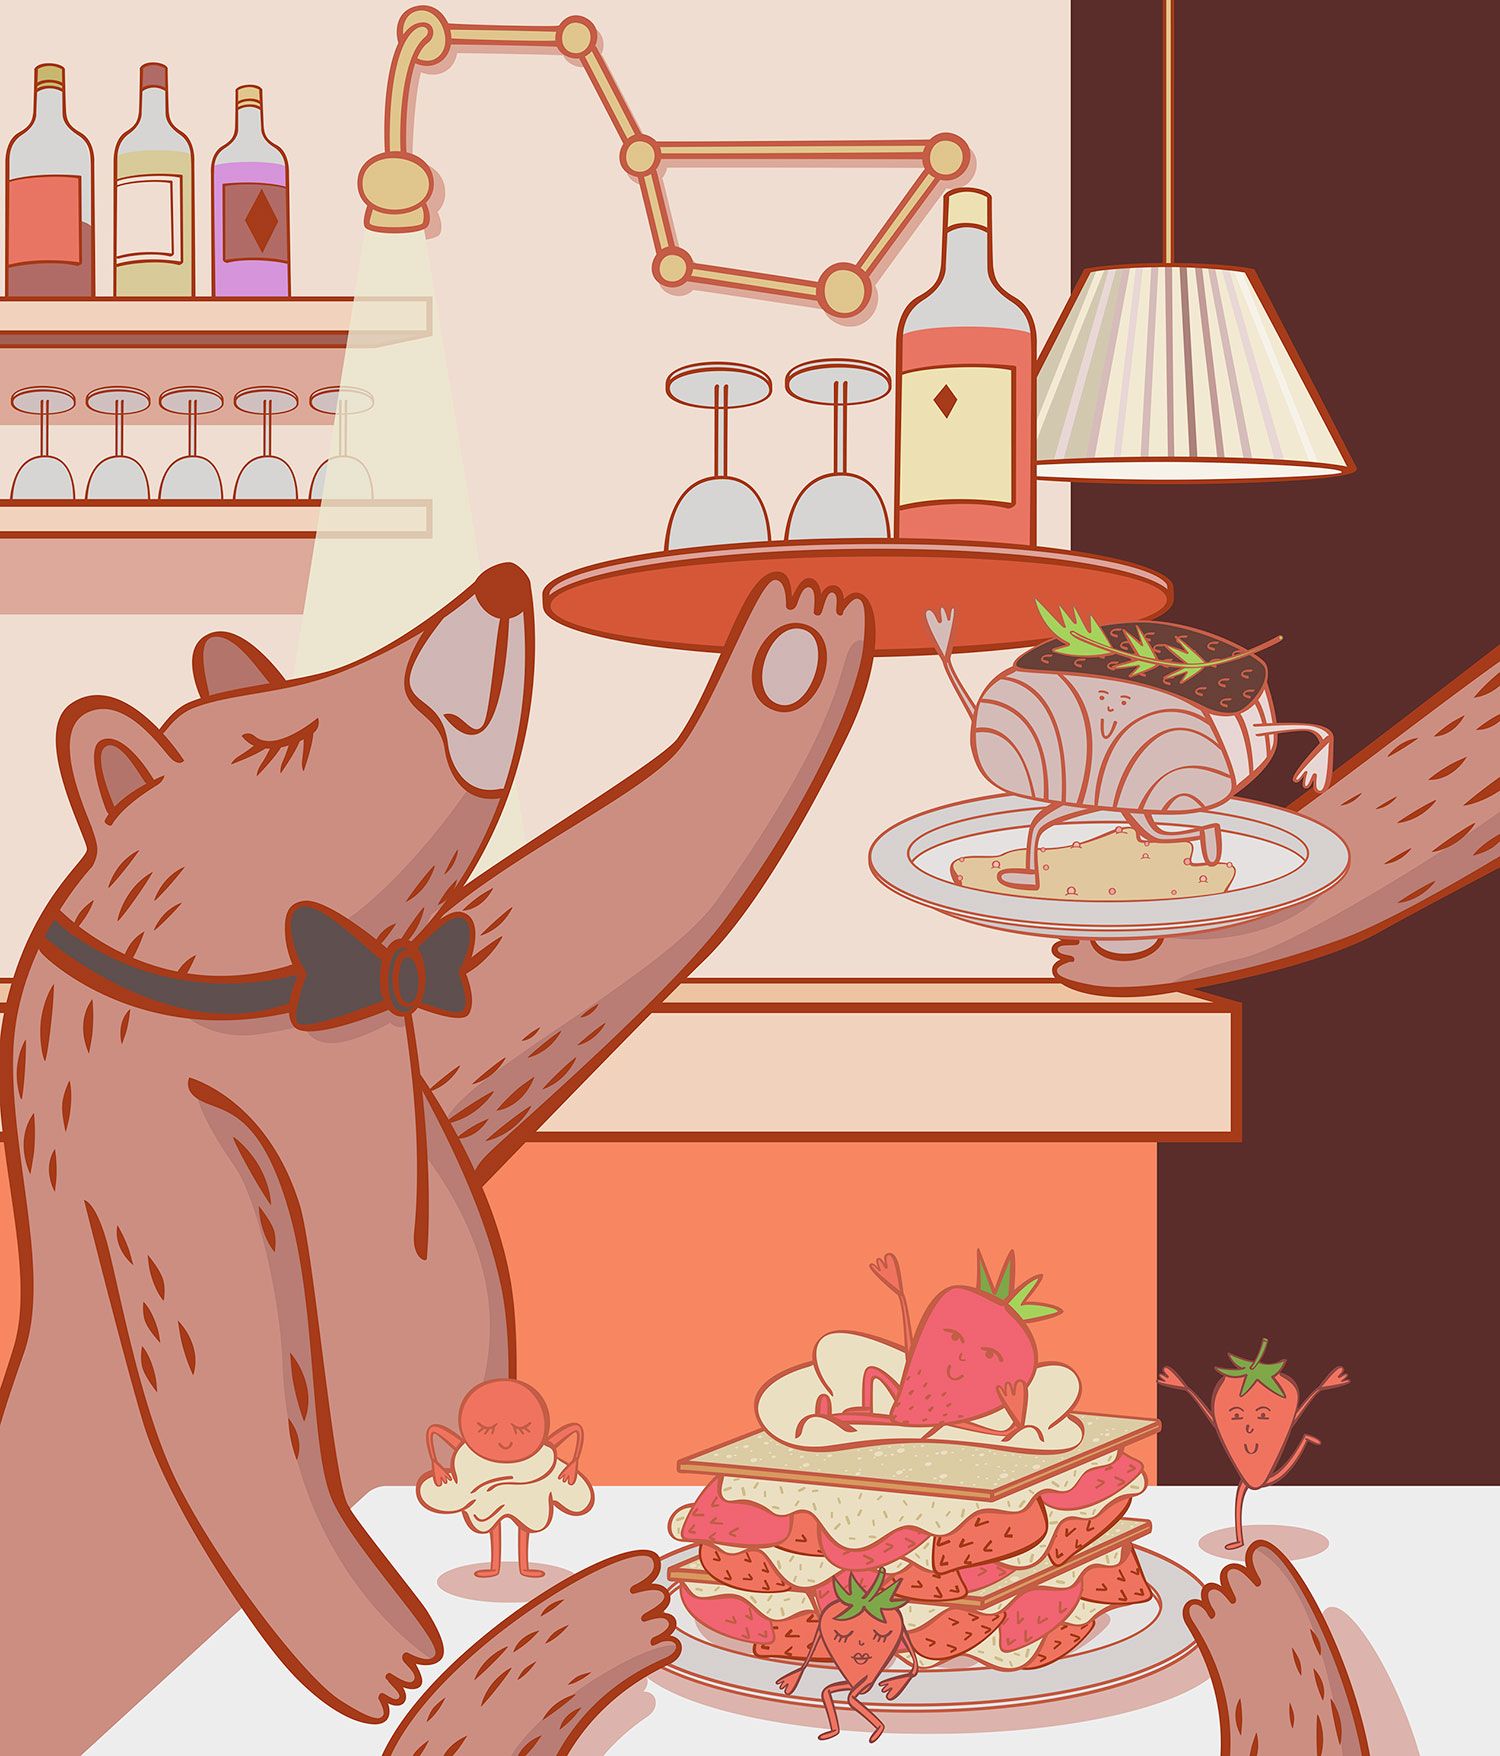 Restaurant Review Illustrated: La Grande Ourse in Paris.